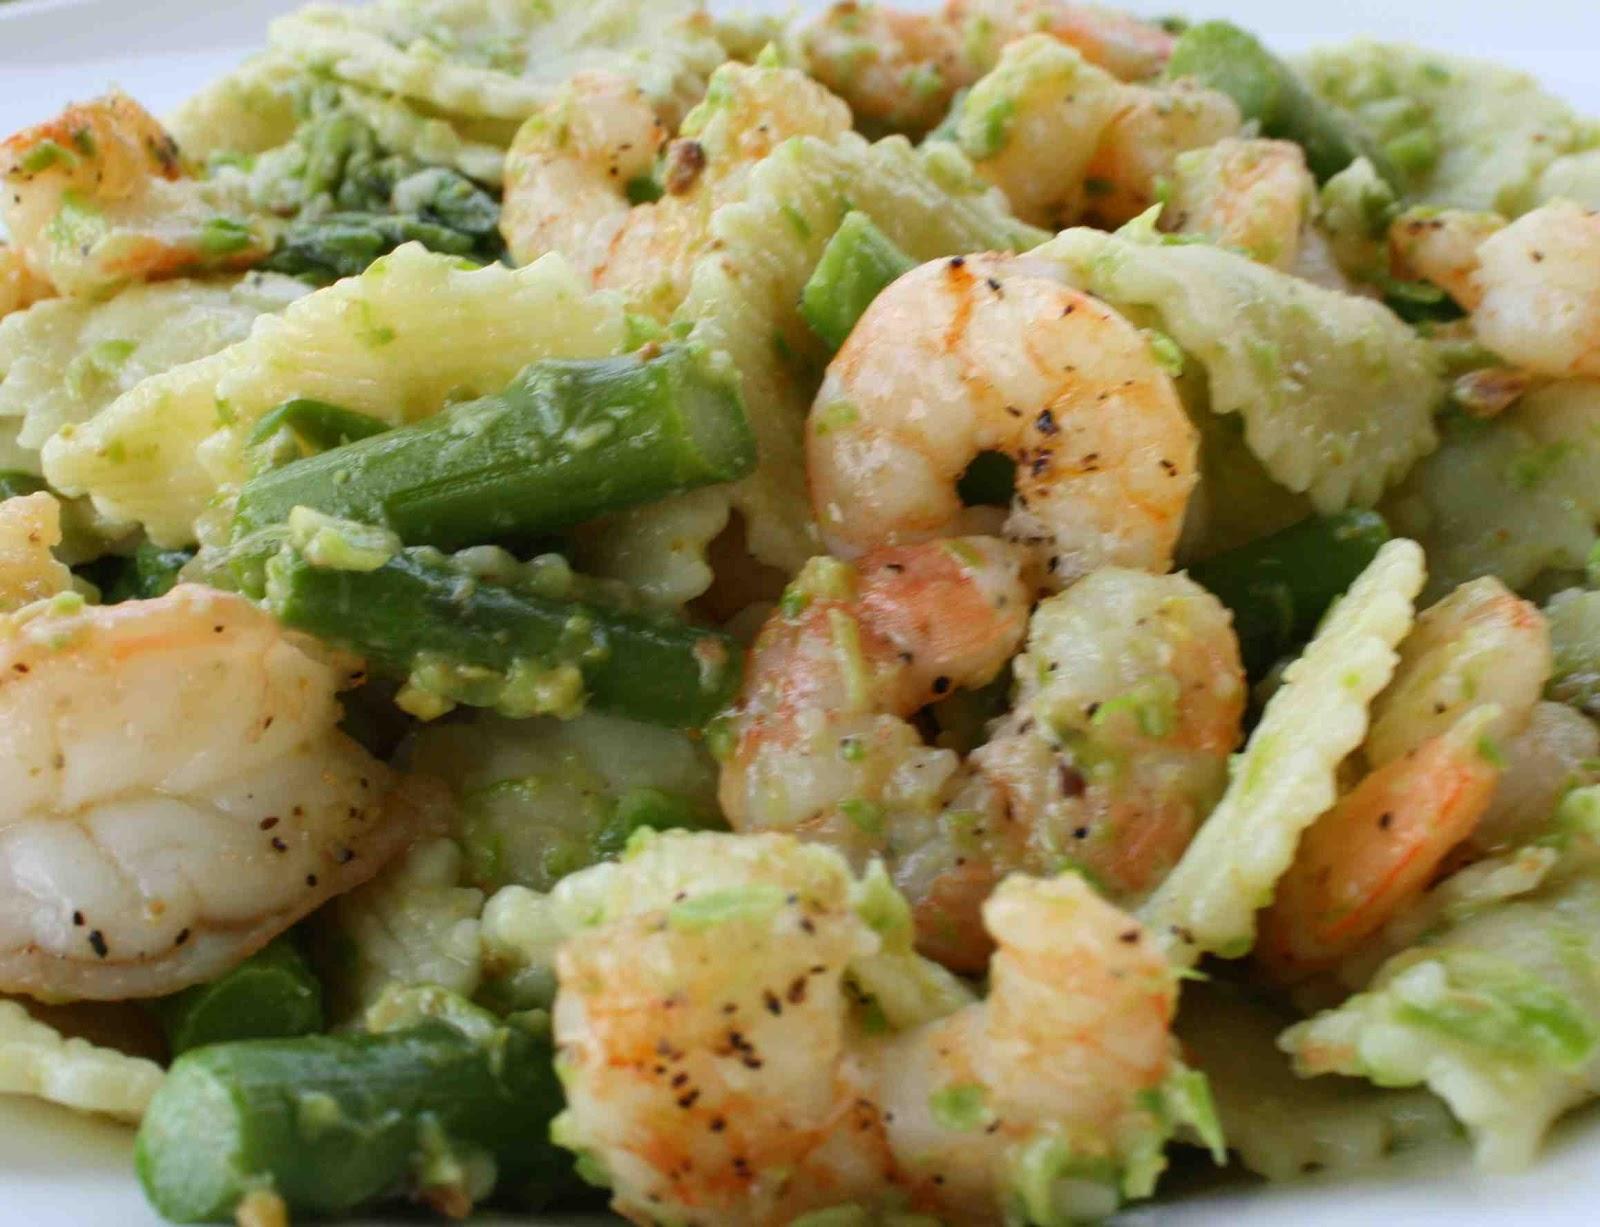 Keeley's Maine Kitchen Kapers: Pasta with Asparagus-Pistachio Pesto